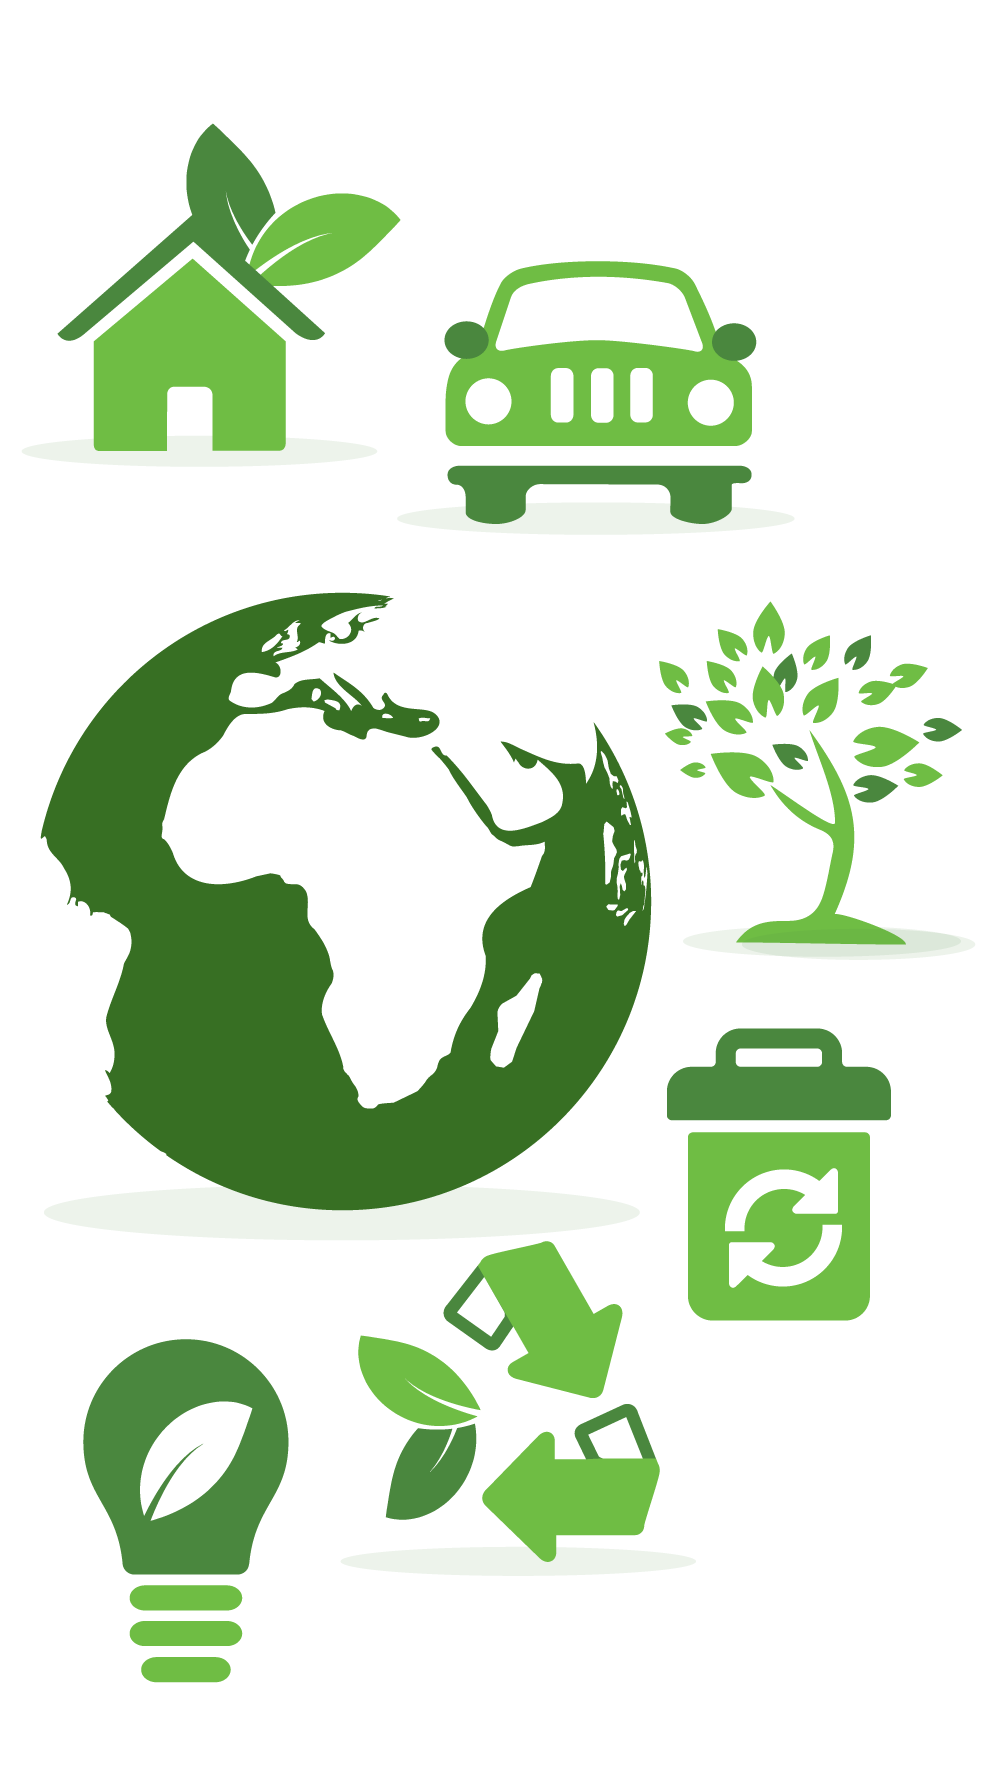 Environment clipart environmental safety. Design considerations nova battery